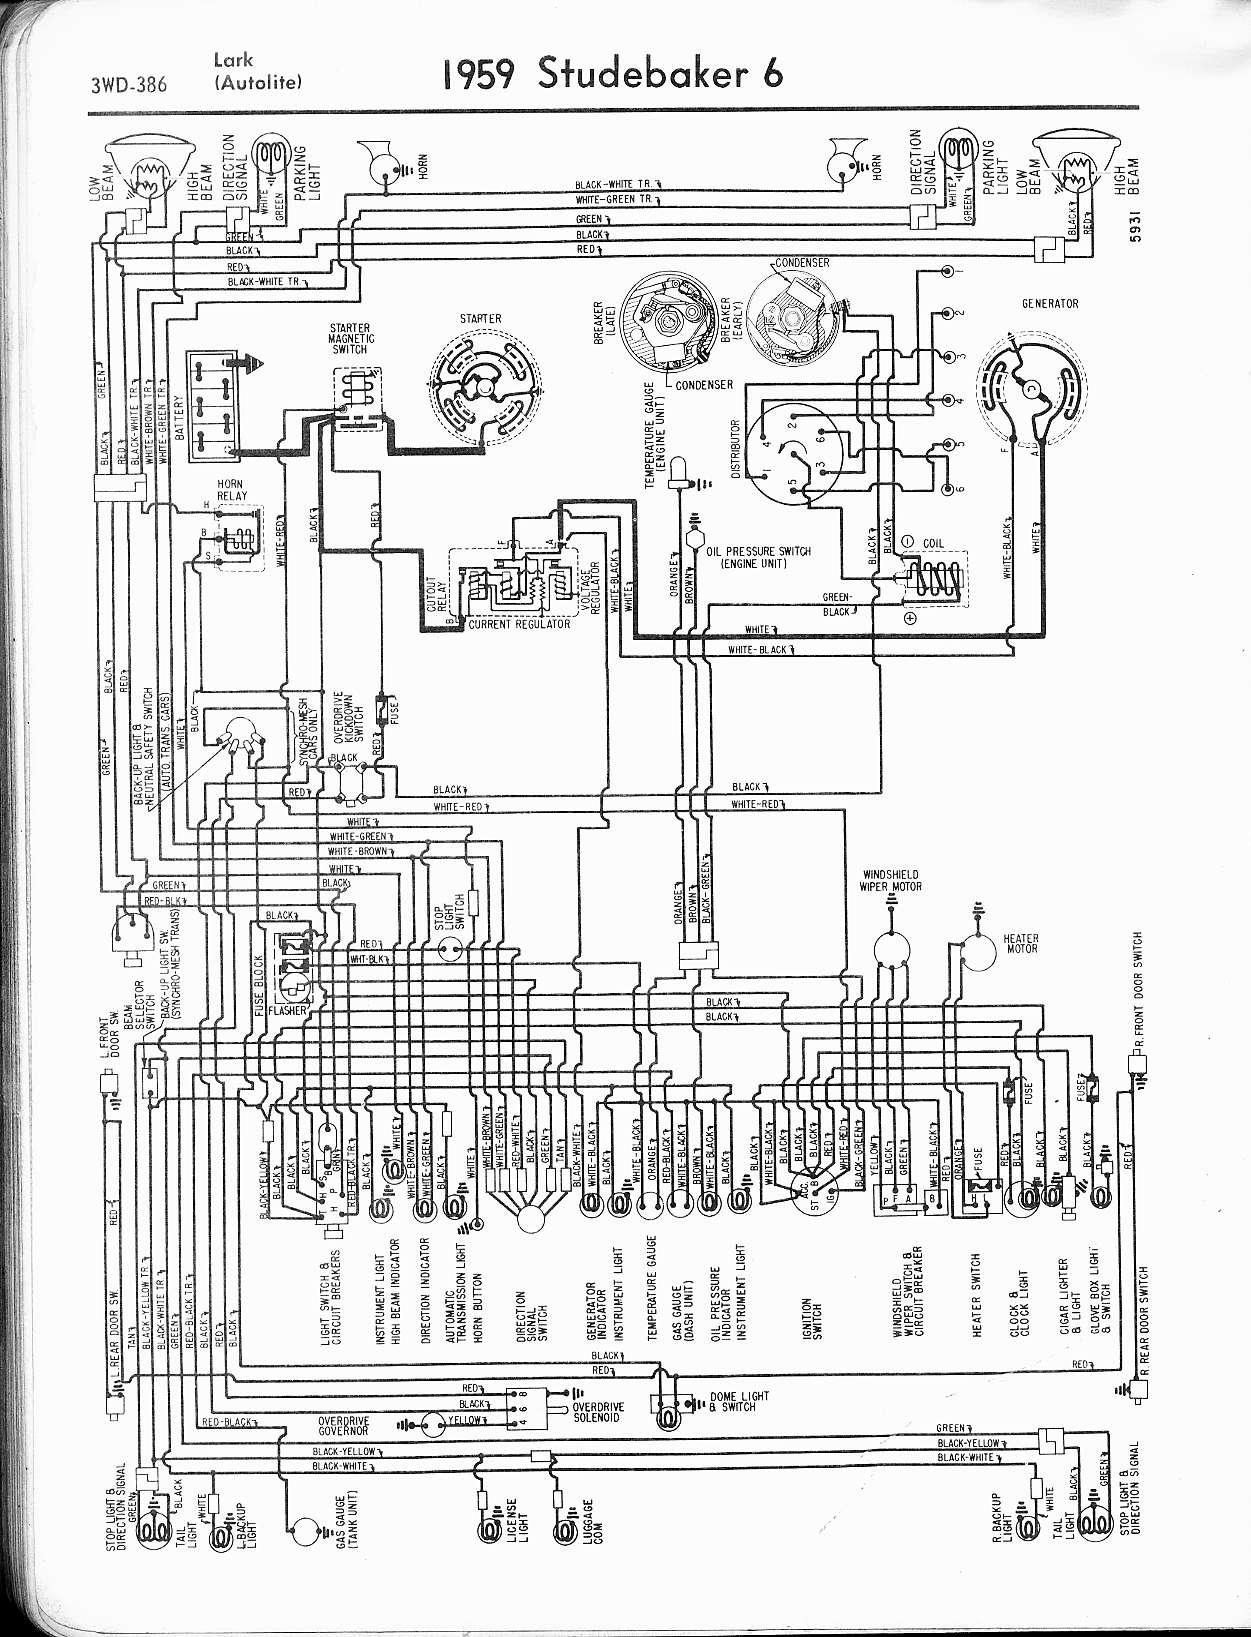 wiring diagram studebaker wiring diagrams studebaker wiring diagrams